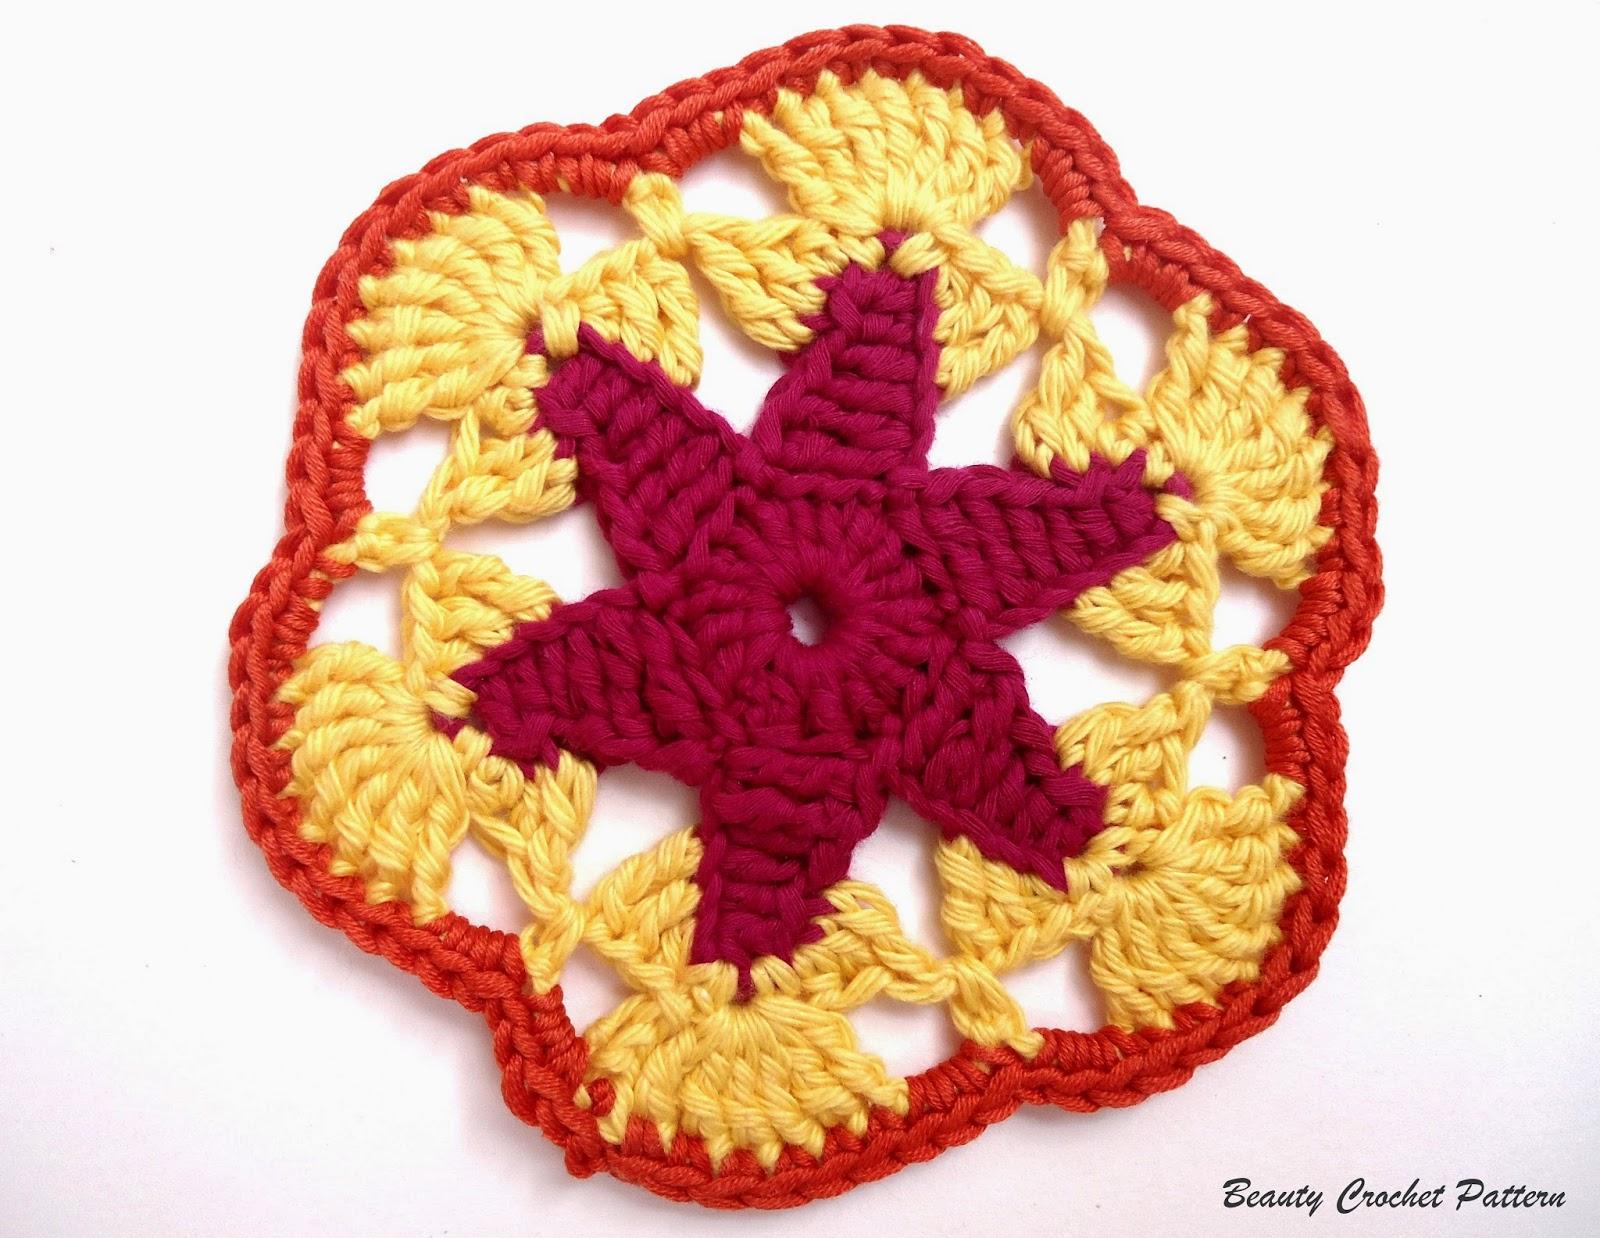 Star Hexagonal Motif ~ Beauty Crochet Pattern